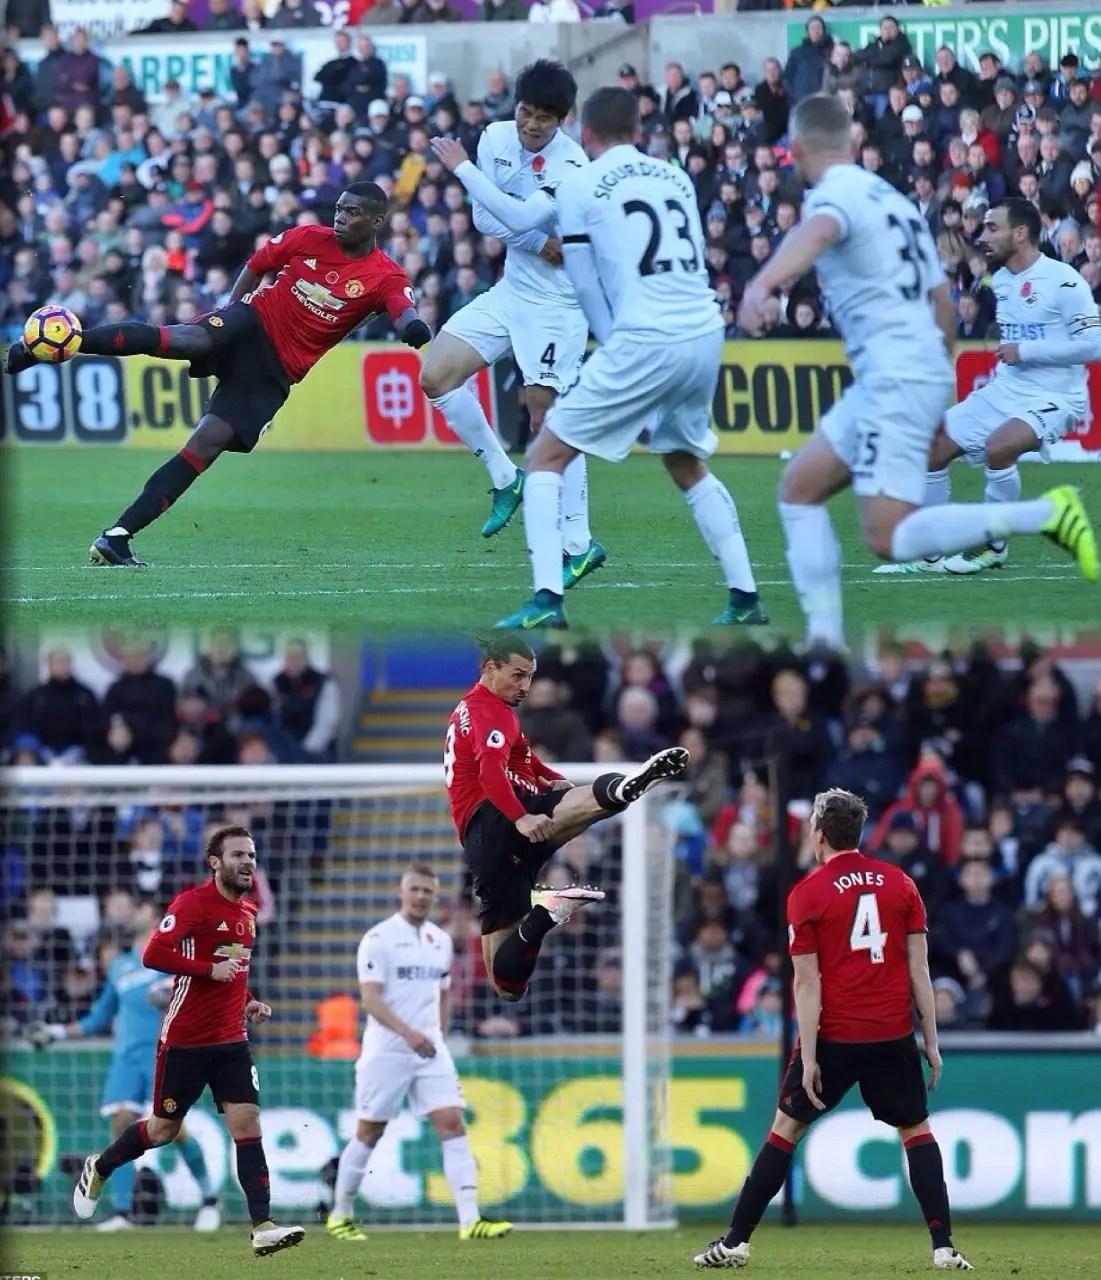 Pogba, Zlata Shoot Down Swansea As United End Winning Drought